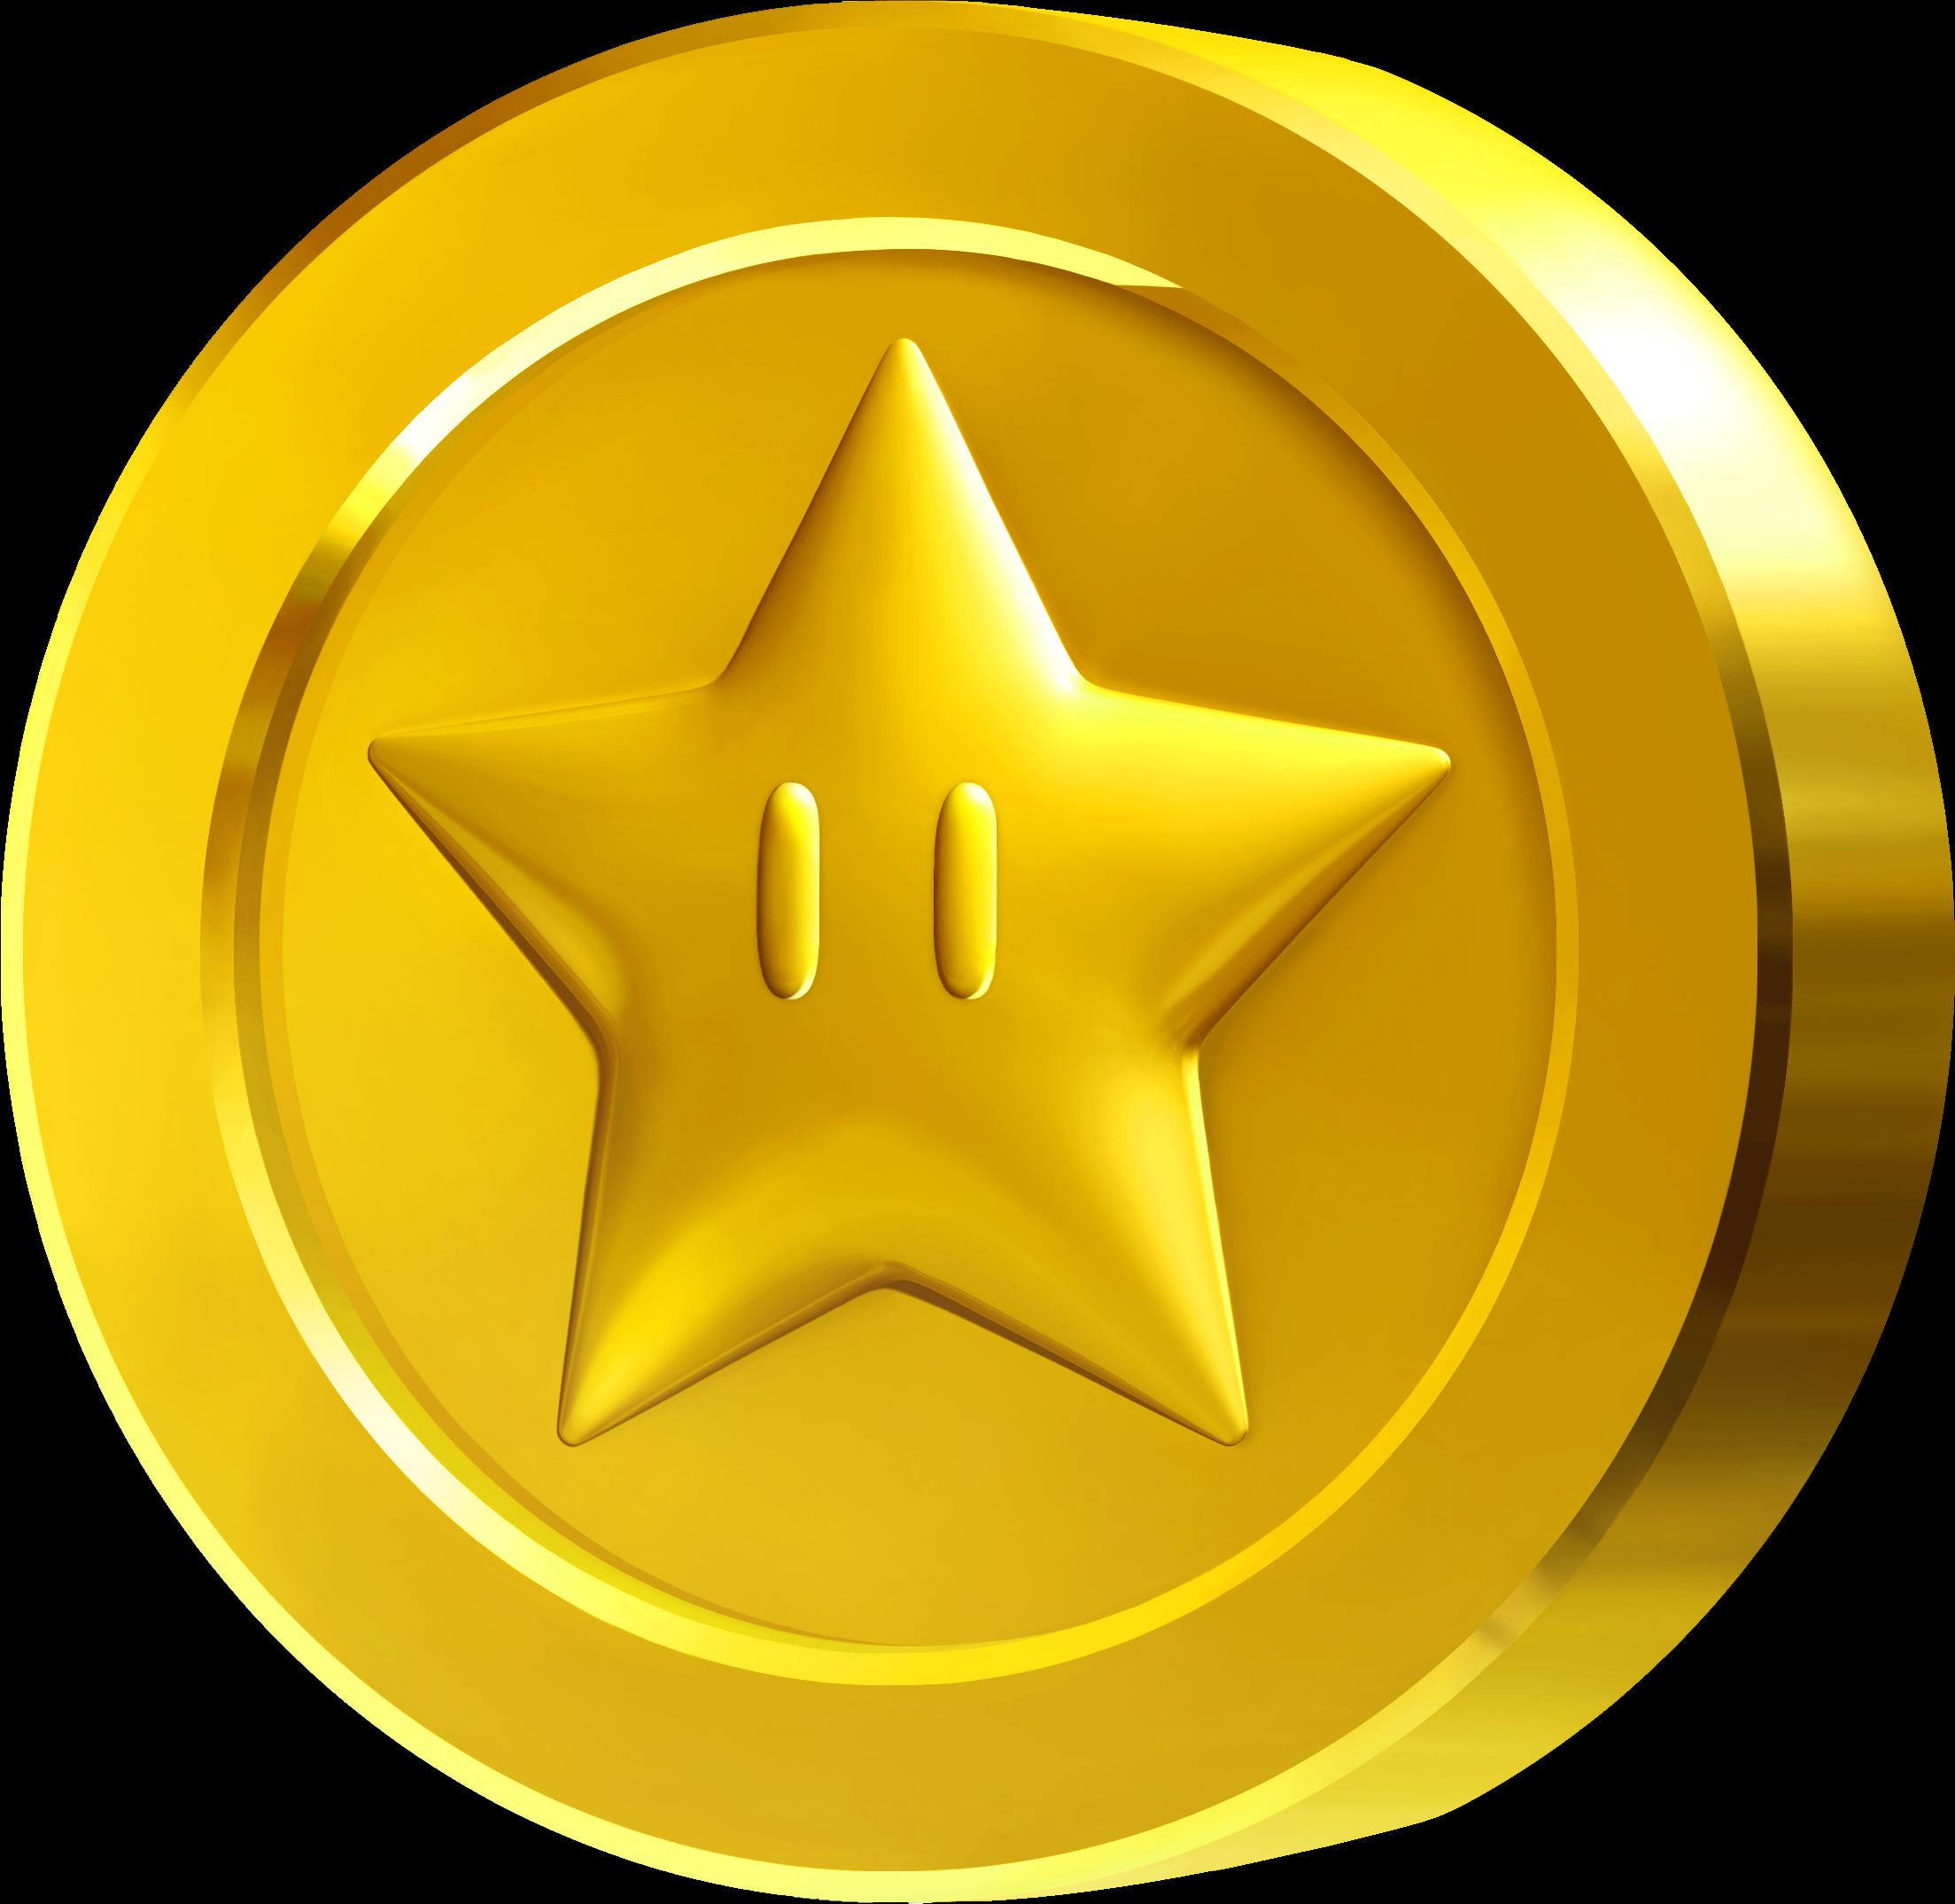 Pin on game ui/icon